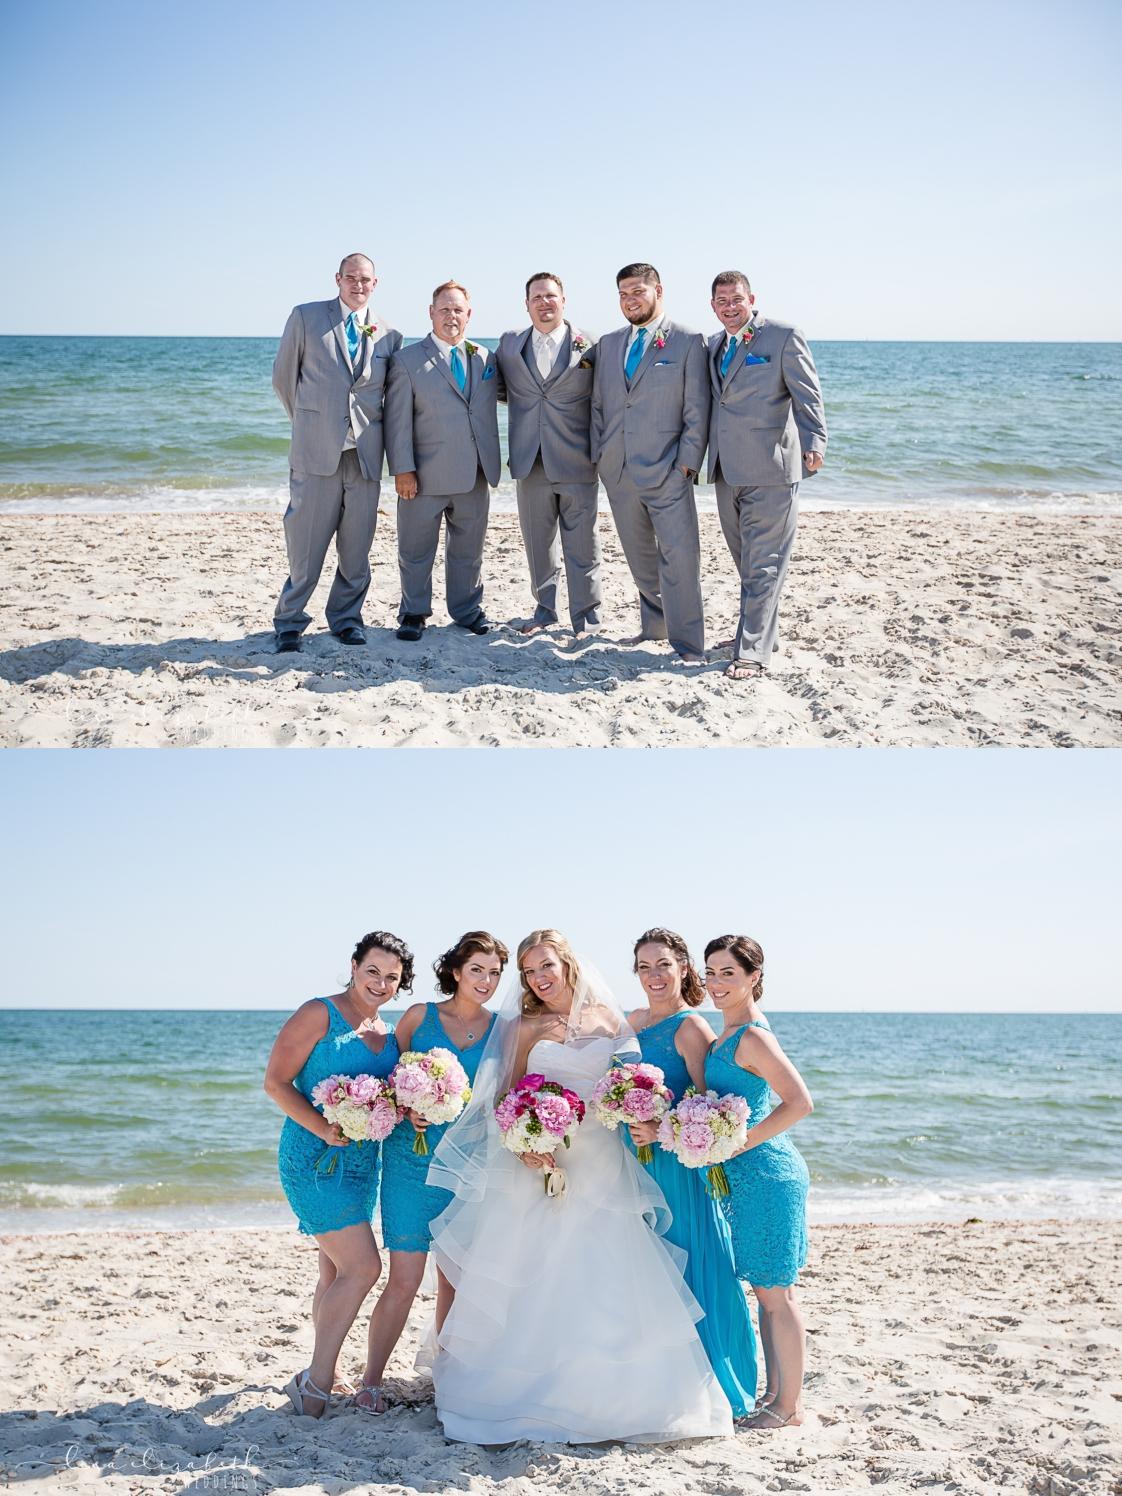 Cape Cod Wedding Photographer | Lisa Elizabeth Images